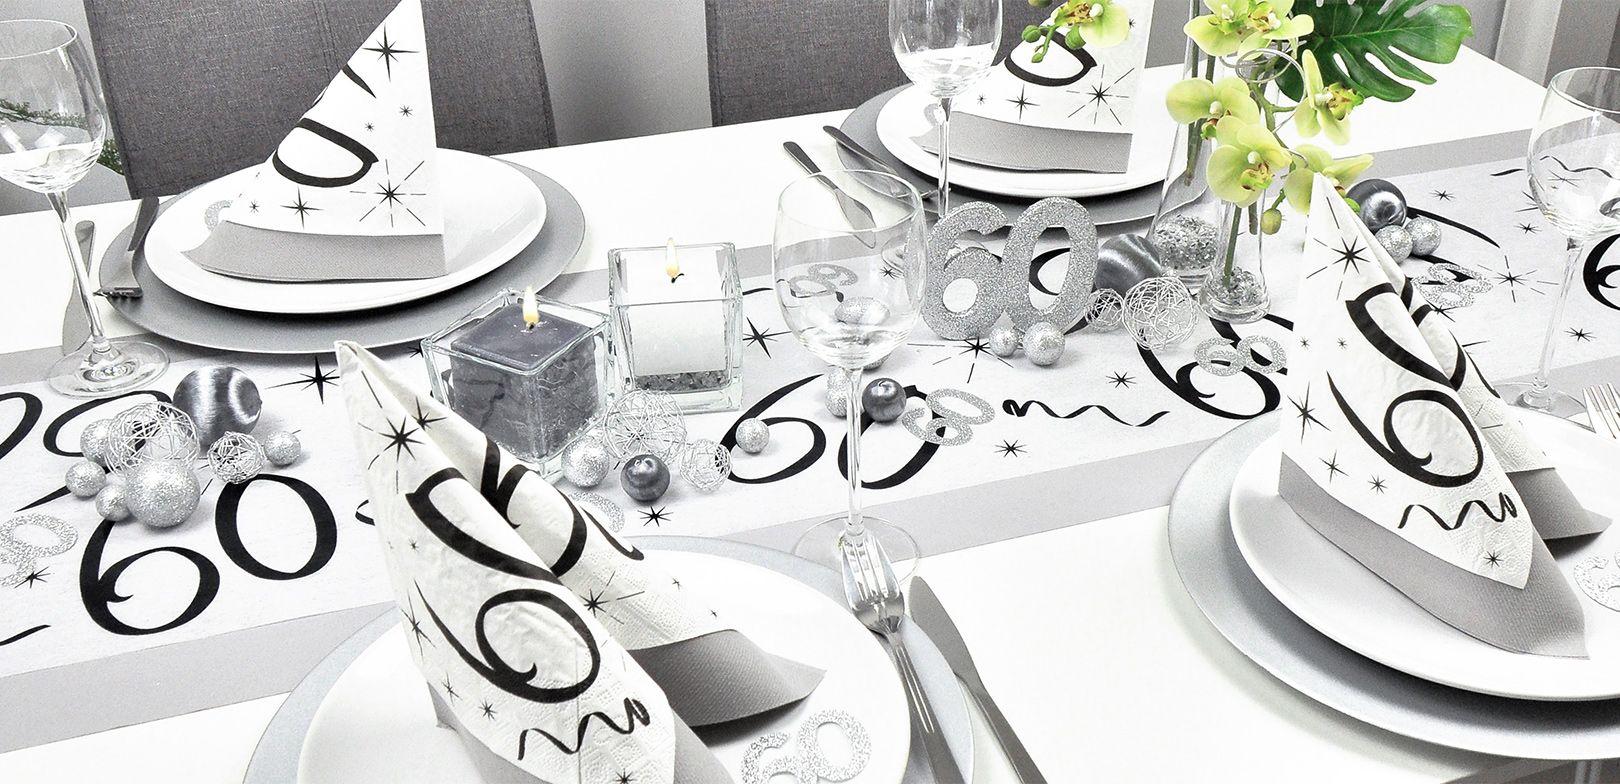 Tischdekoration 60 Geburtstag Aluminium Silber Tischdeko